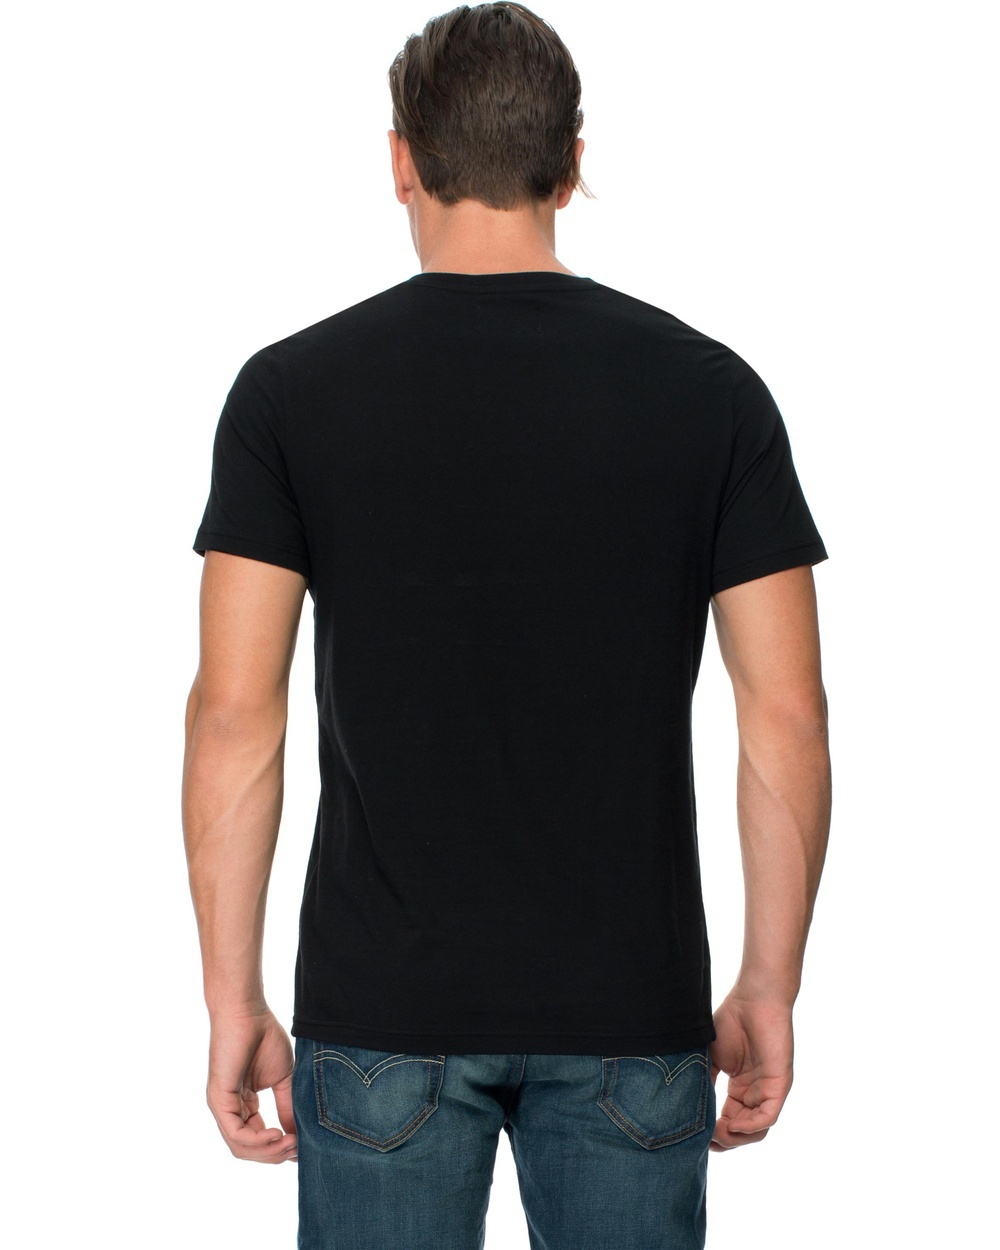 Blank Black V Neck Plain Tshirt Wholesale Buy Plain